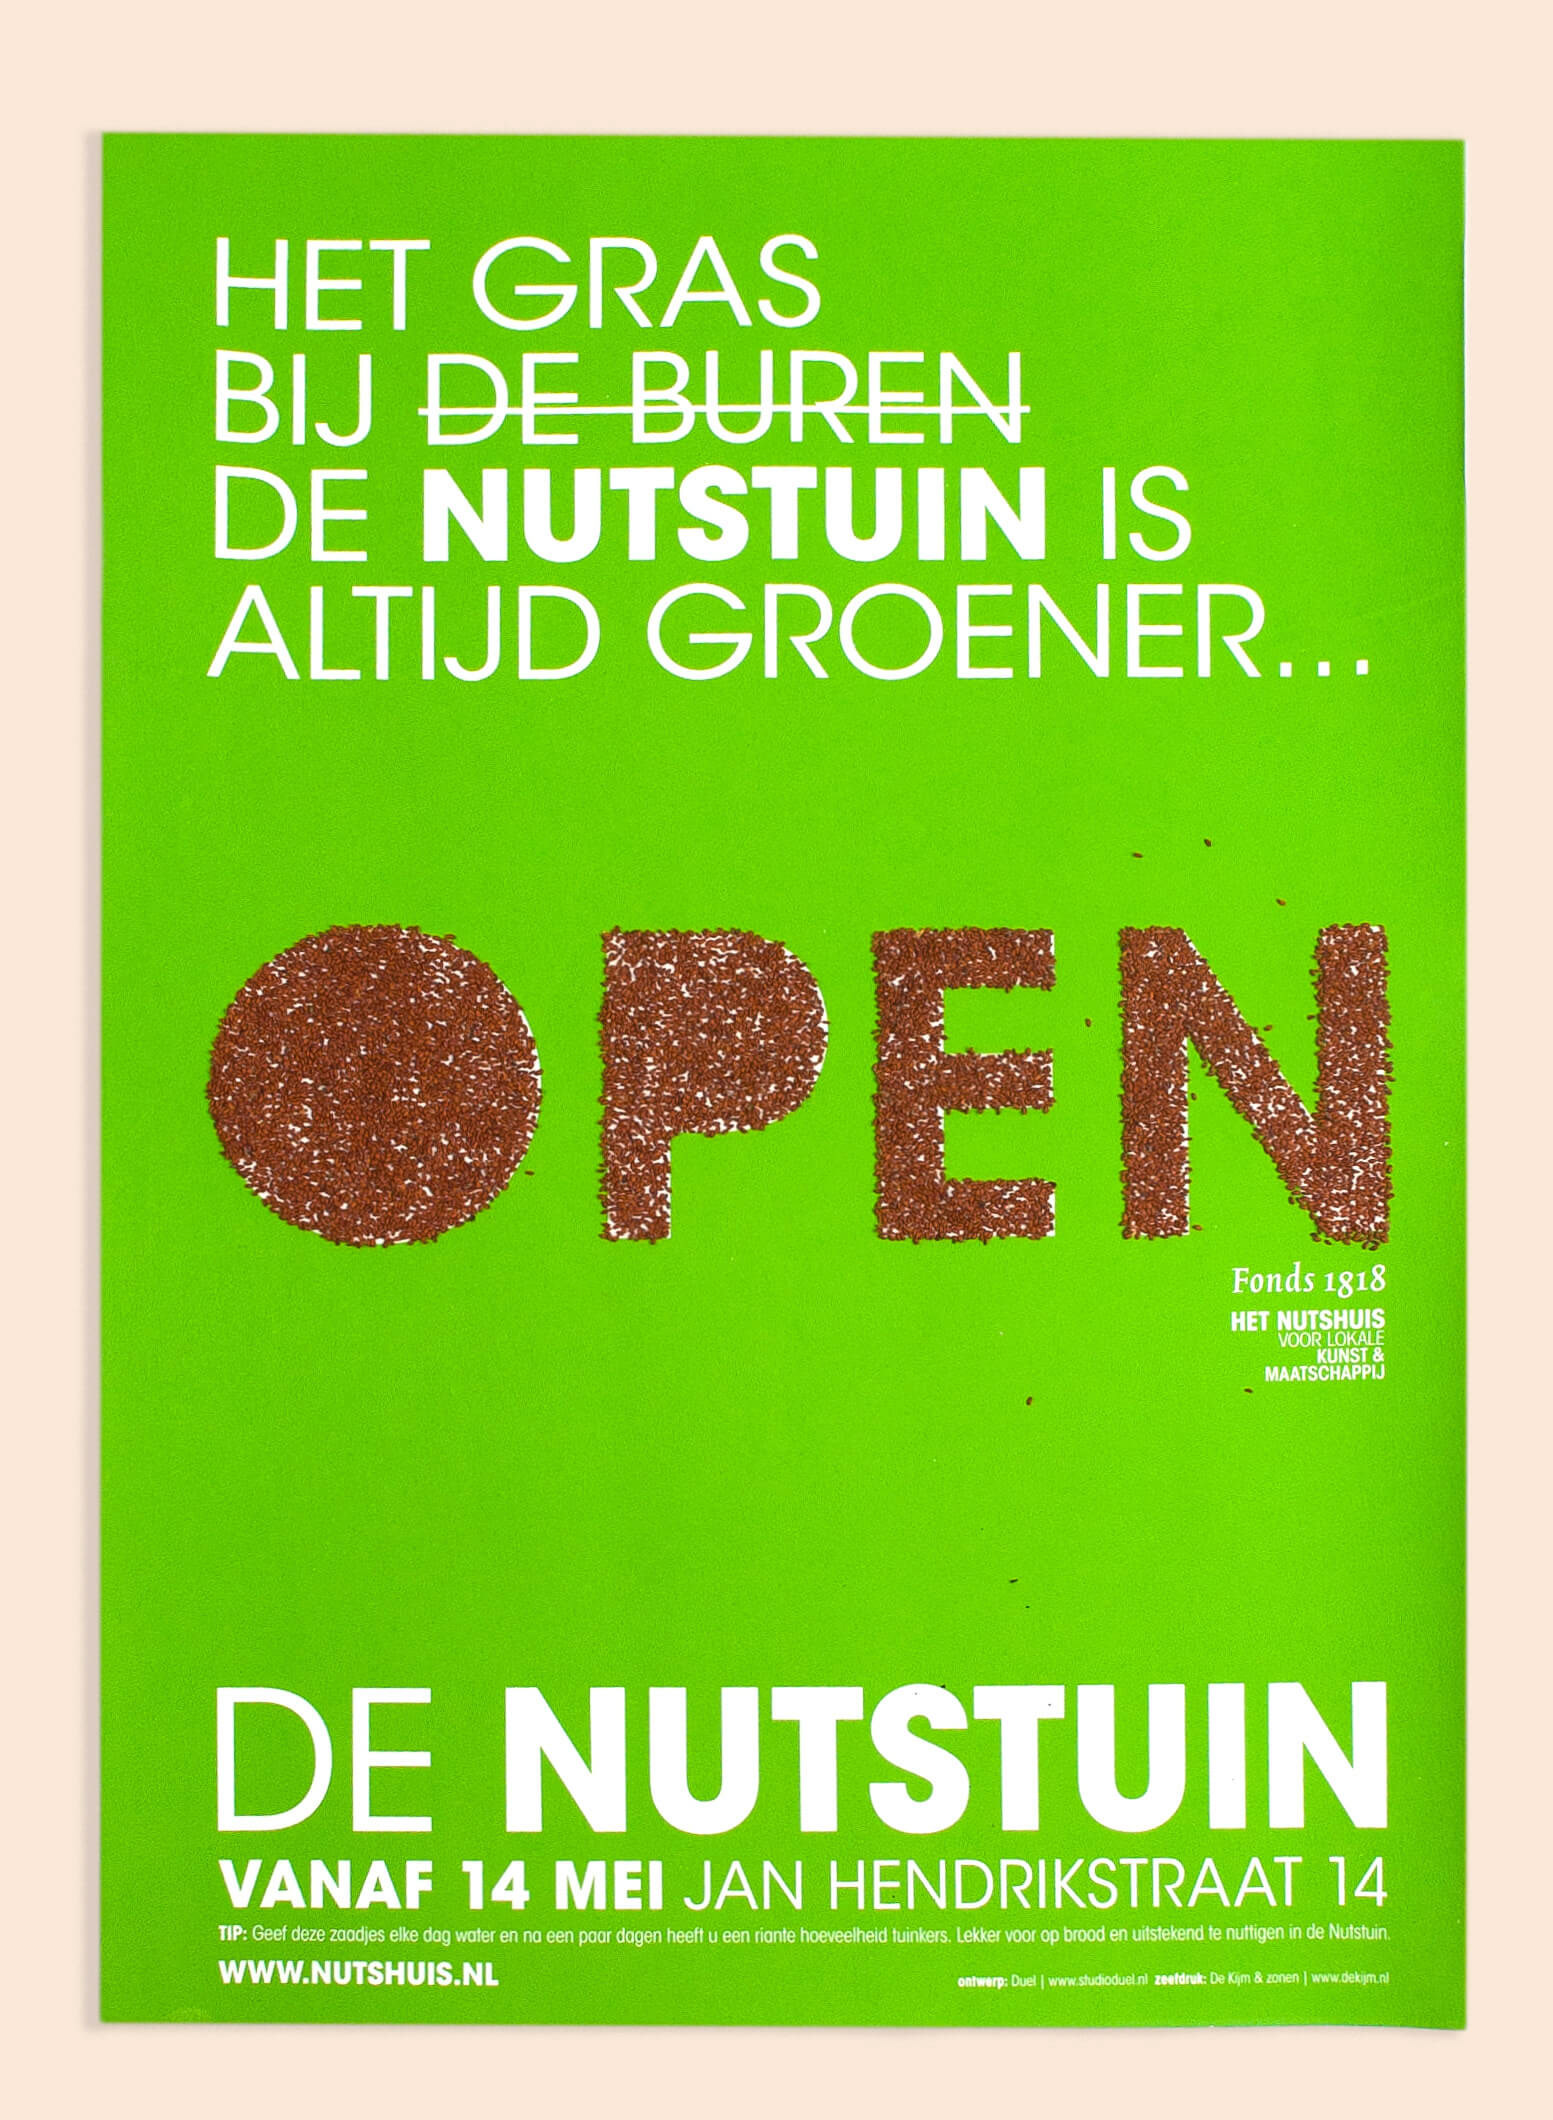 Nutshuis nutstuin campagne, Studio Duel